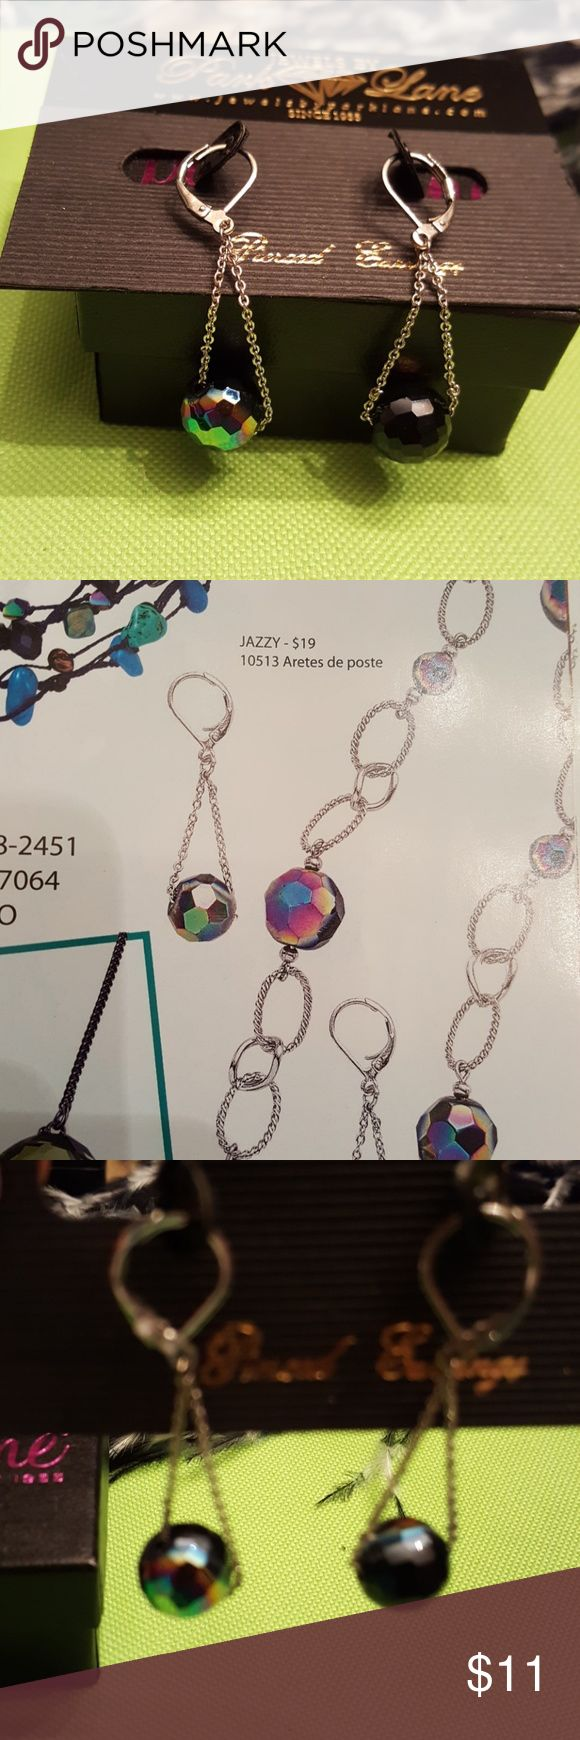 Park Lane jazzy earrings Park lane jazzy earrings. NWT Park Lane Jewelry Earrings